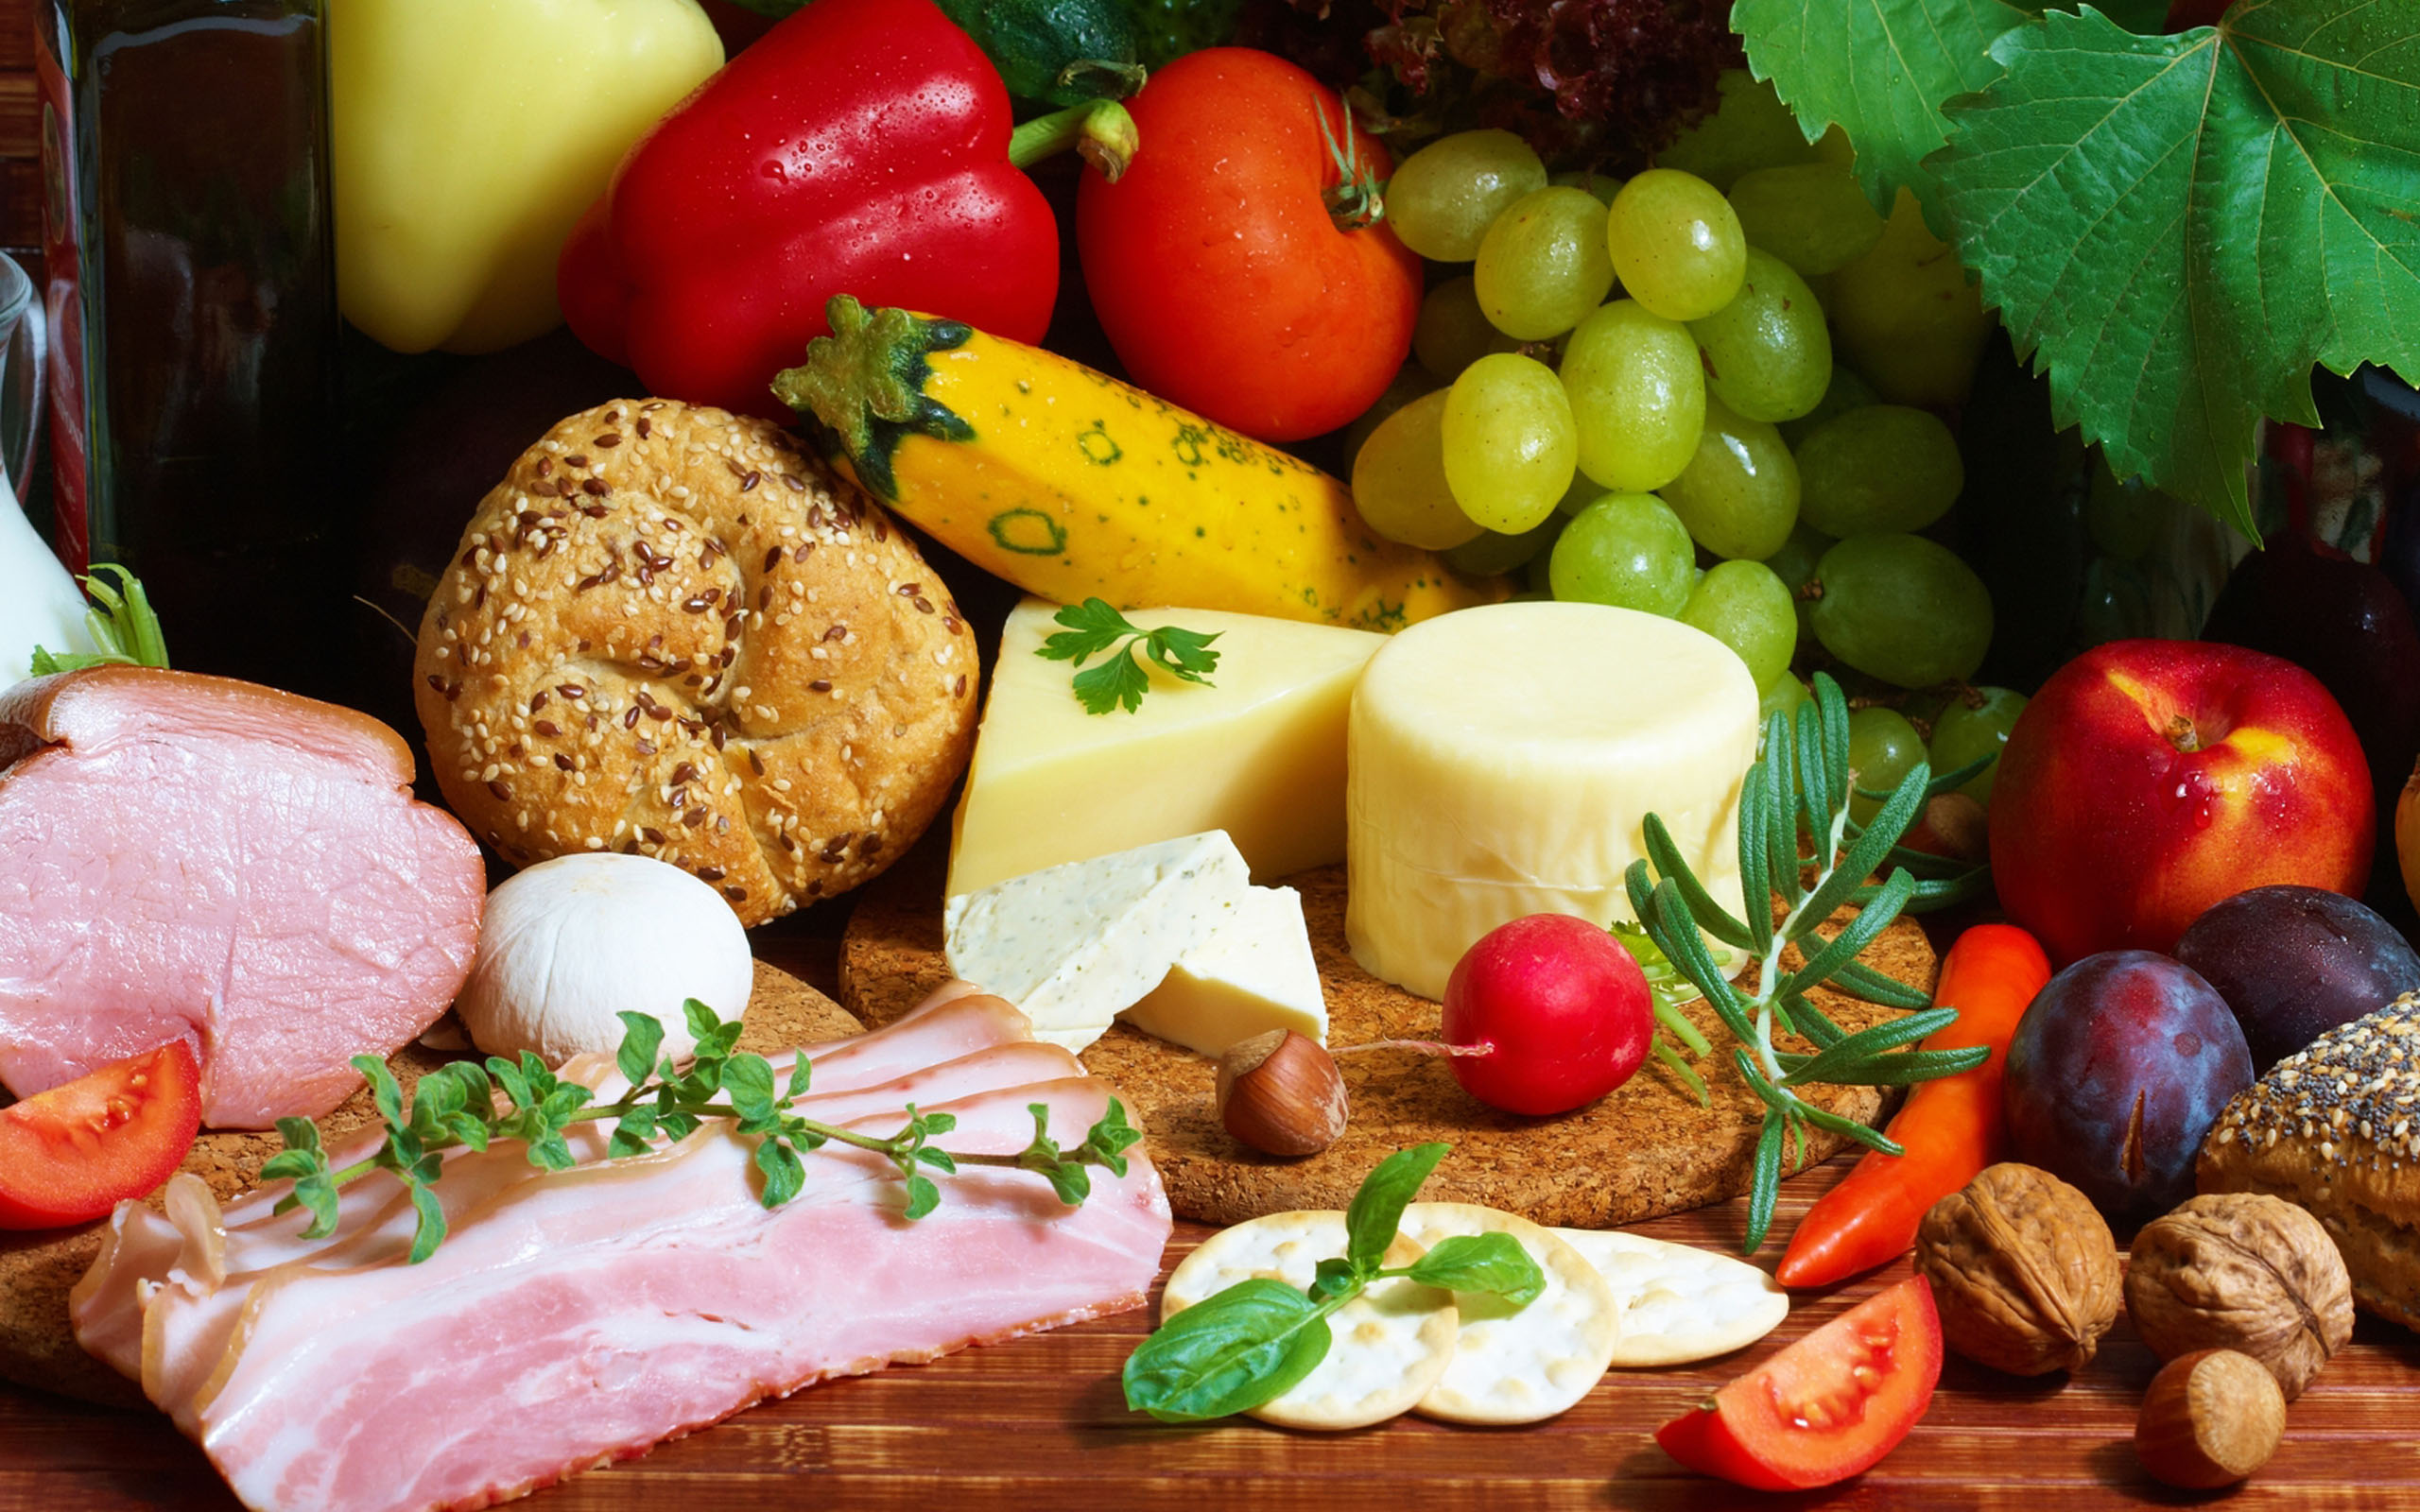 food-wallpaper-13912-14518-hd-wallpapers